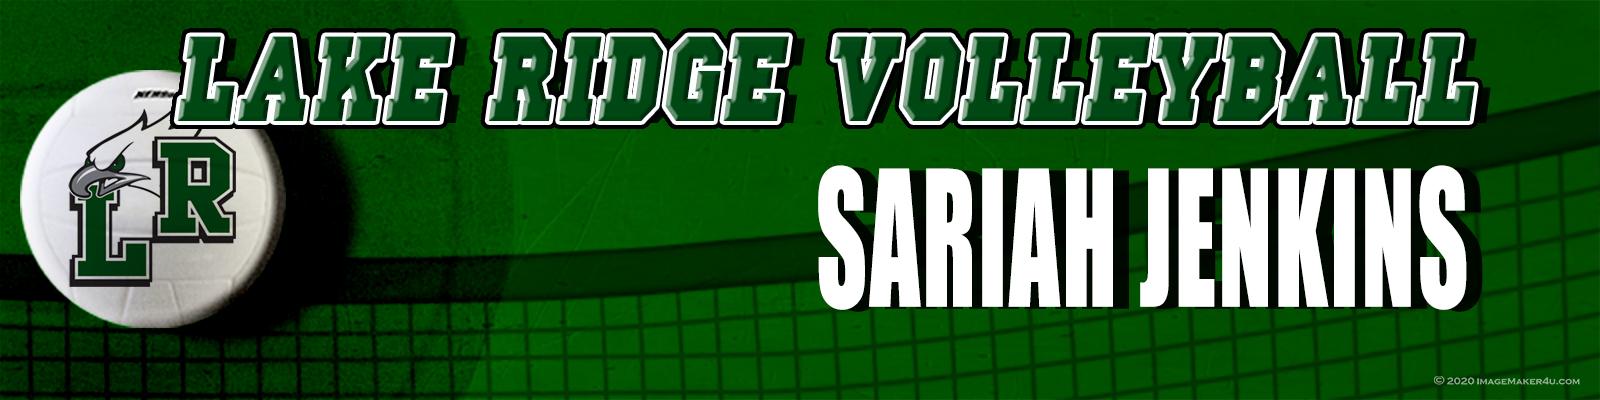 Mansfield Lake Ridge VB Sub-Varsity Locker Sariah Jenkins Tags 2in x 8in